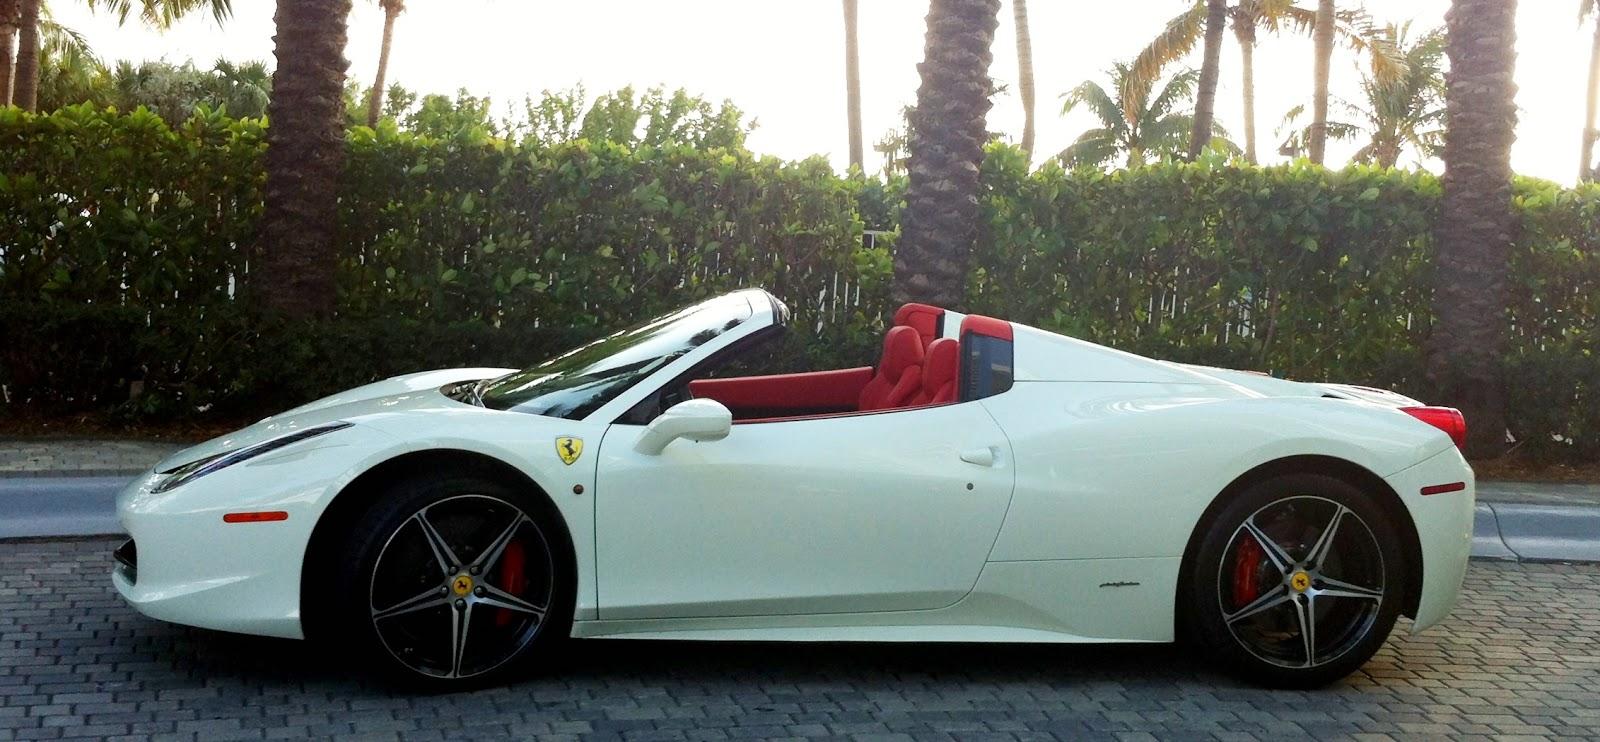 Ferrari 458 Italia Spider | Exotic Cars on the Streets of ...